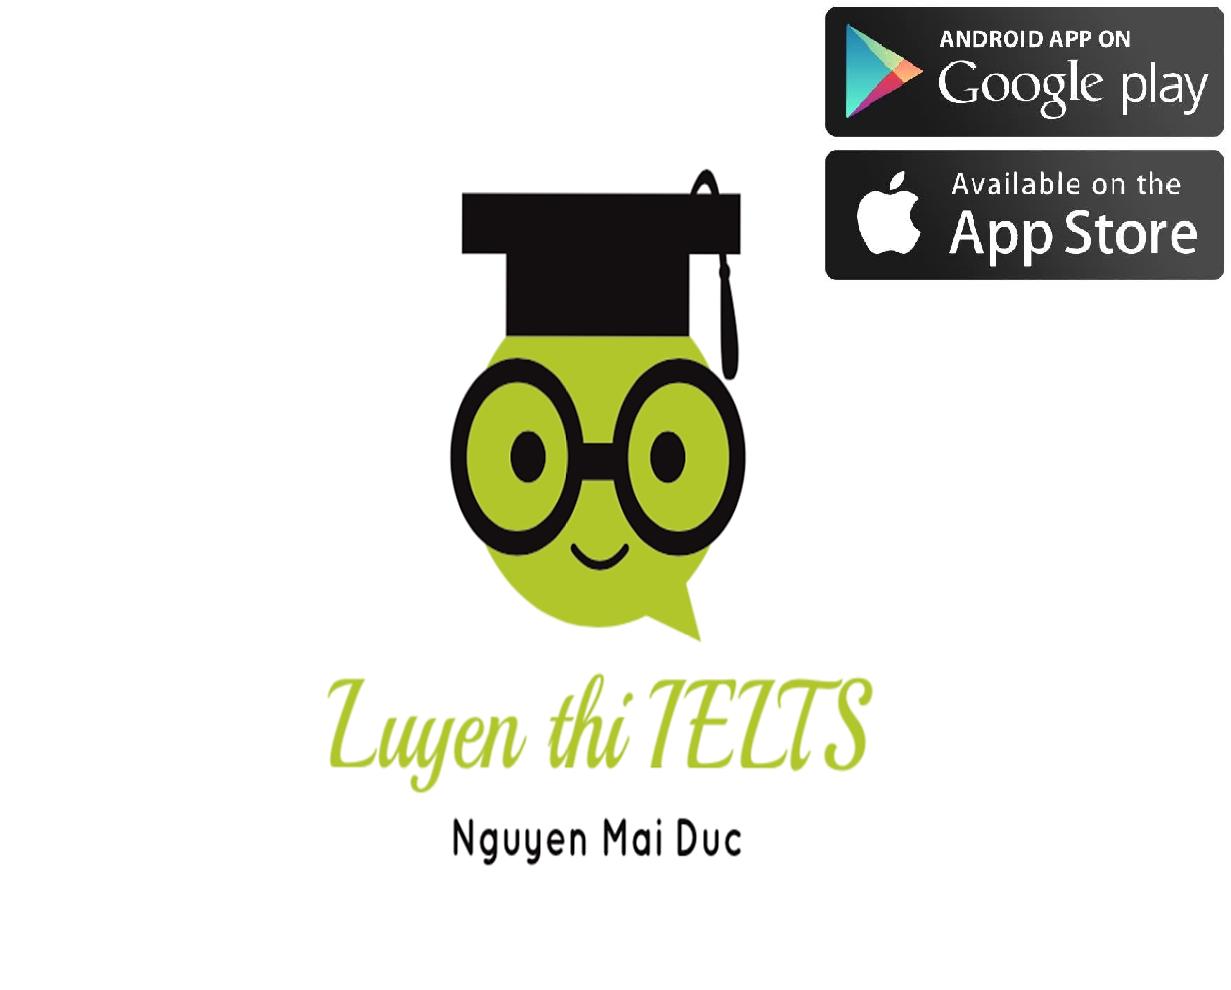 My mobile app